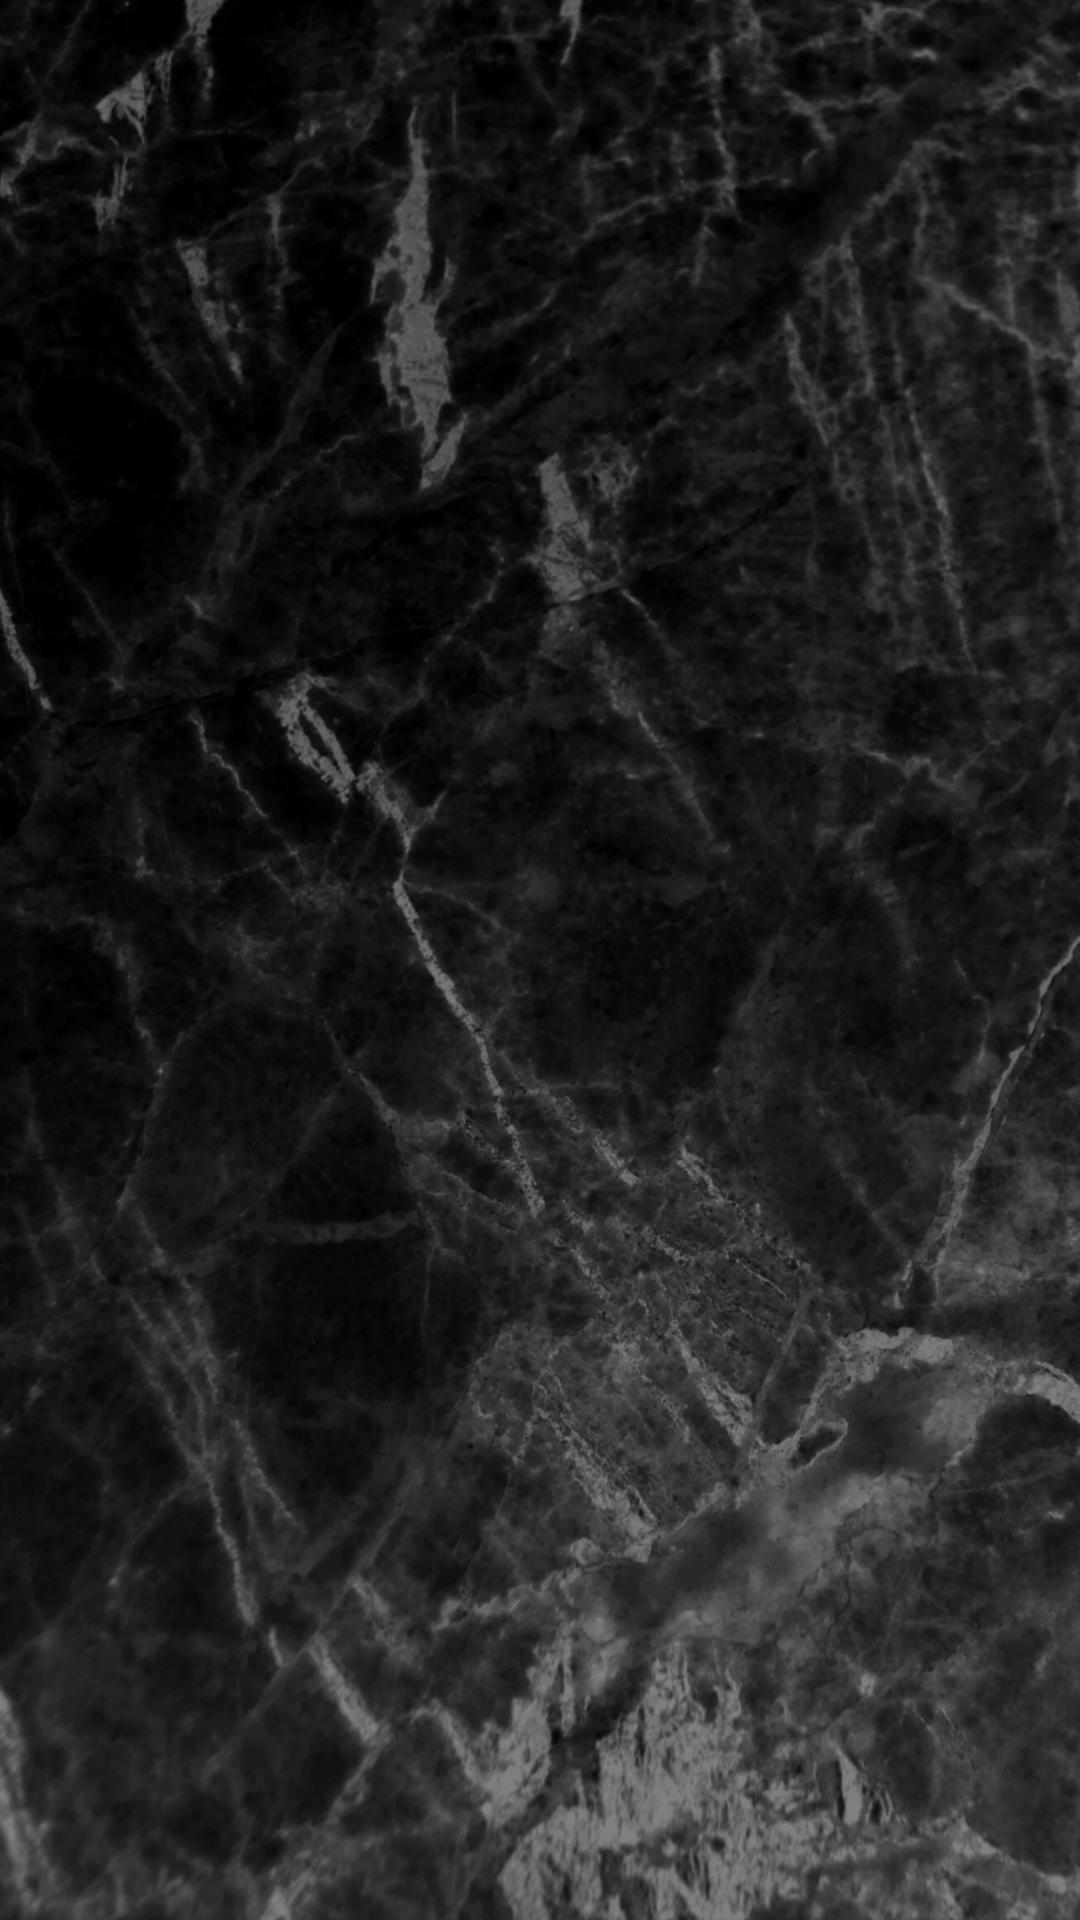 Black Marble Background In 2020 Black Wallpaper Wallpaper Backgrounds Backgrounds For Your Phone